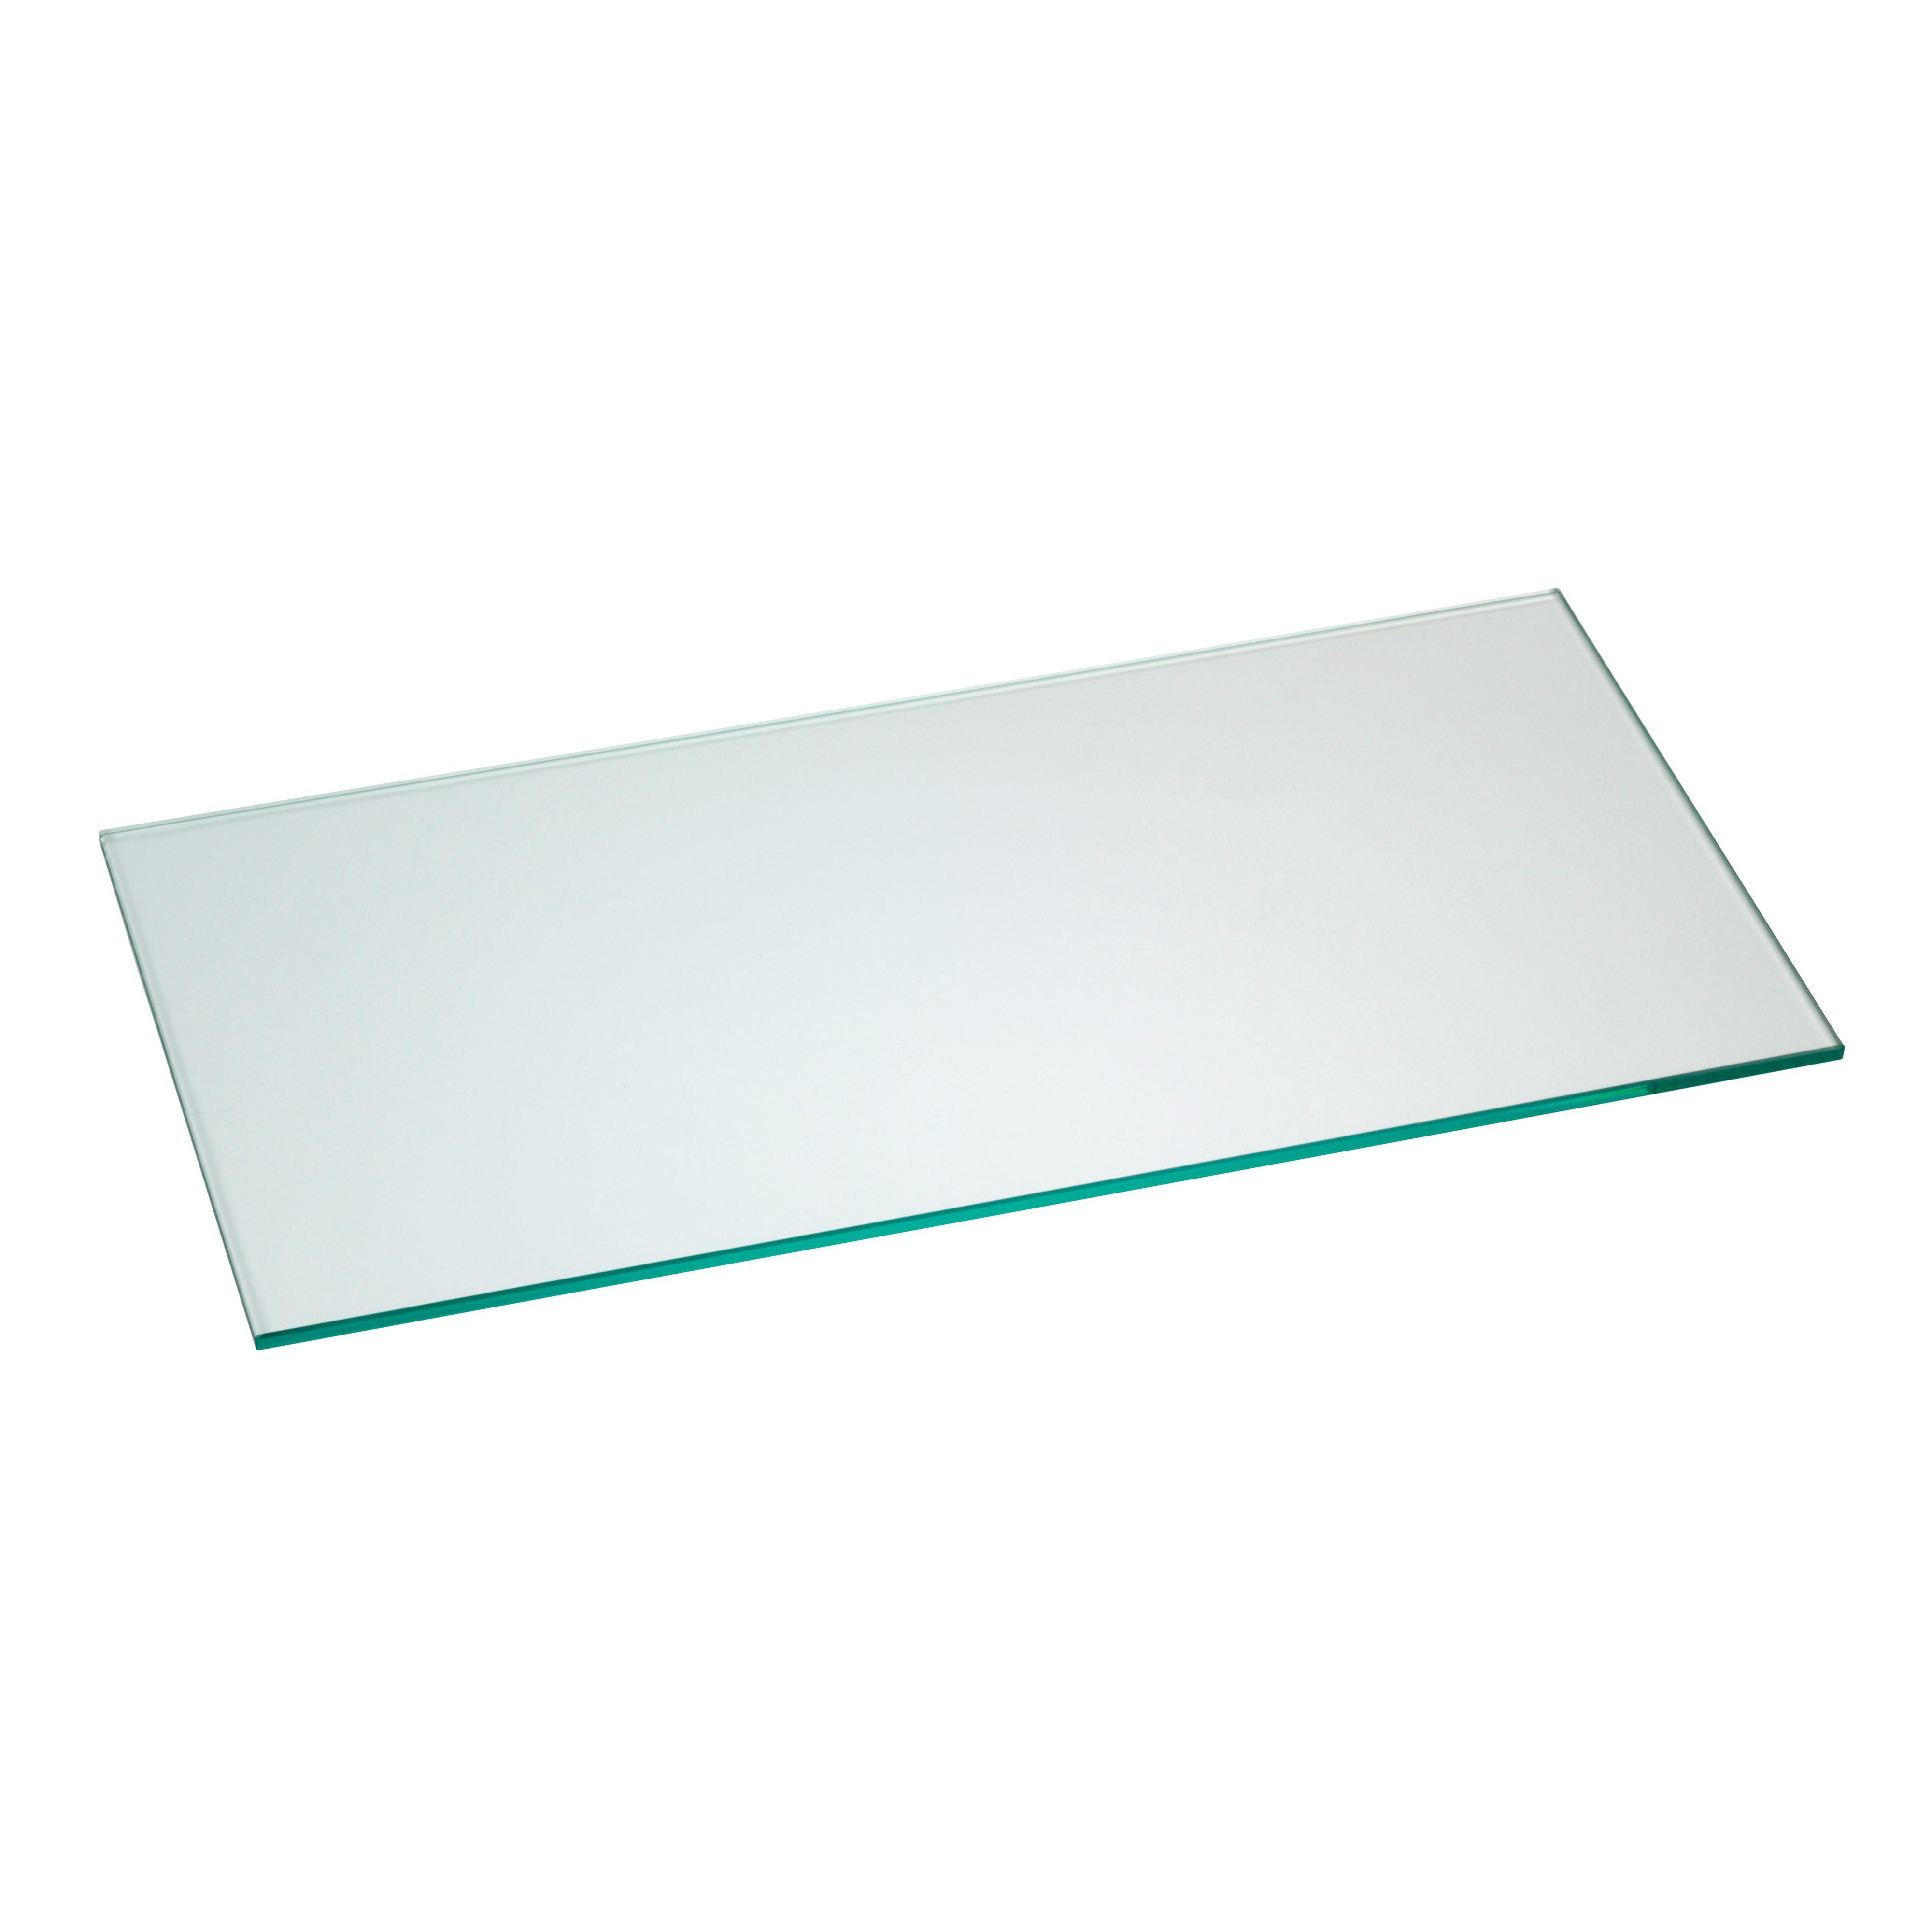 Clear Glass Shelf (l)451mm (d)220mm